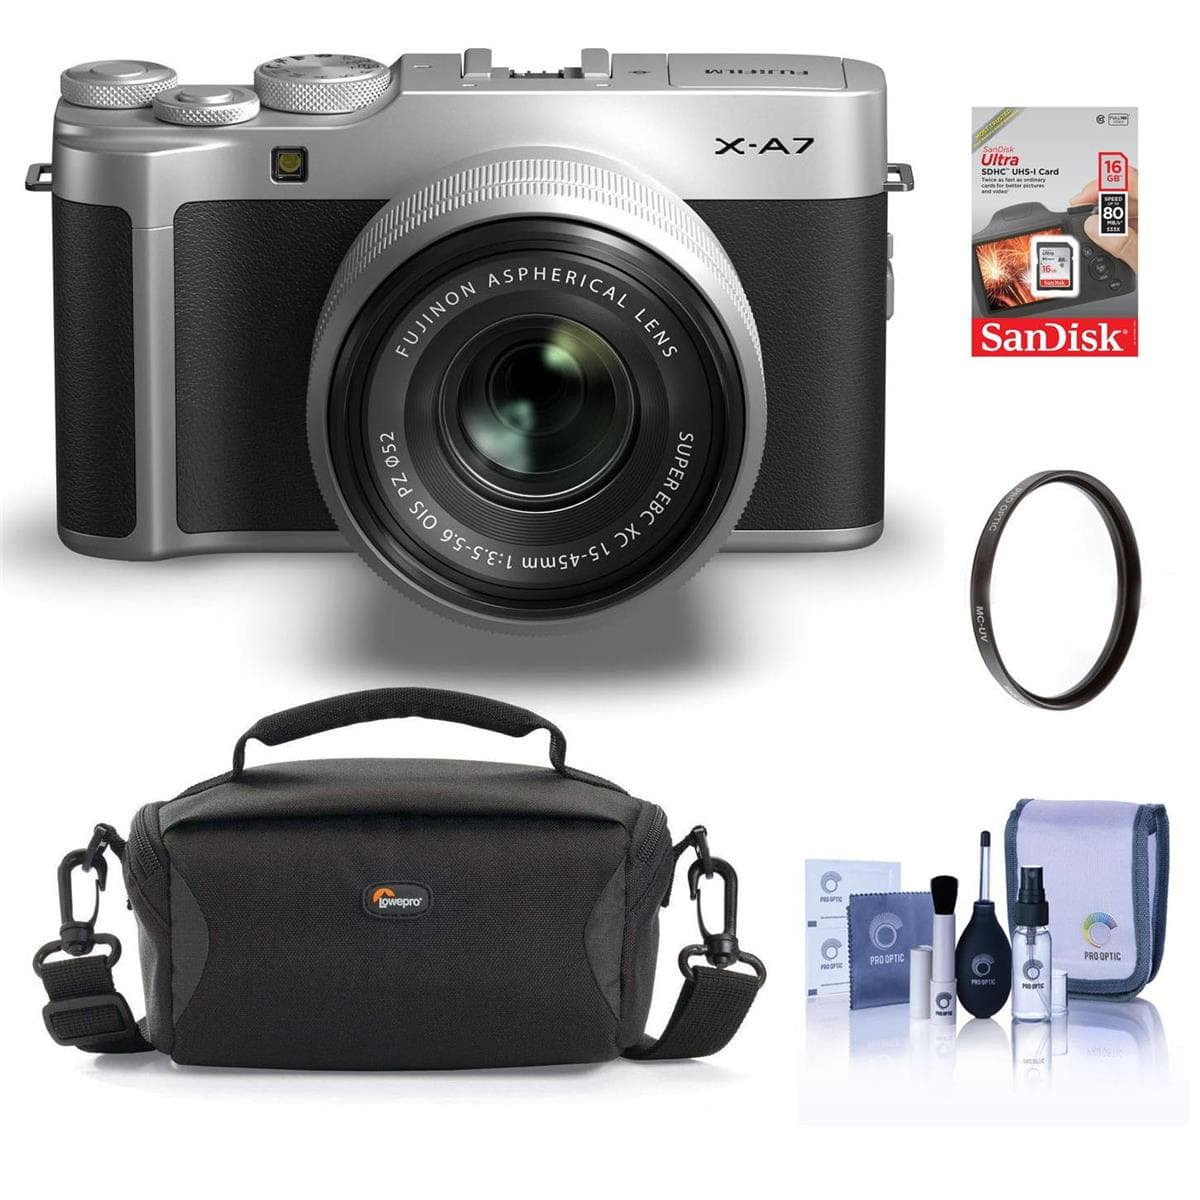 Fujifilm Mirrorless Digital Cameras: X-T200 (Body) $599, X-A7 w/ 15-45mm Lens